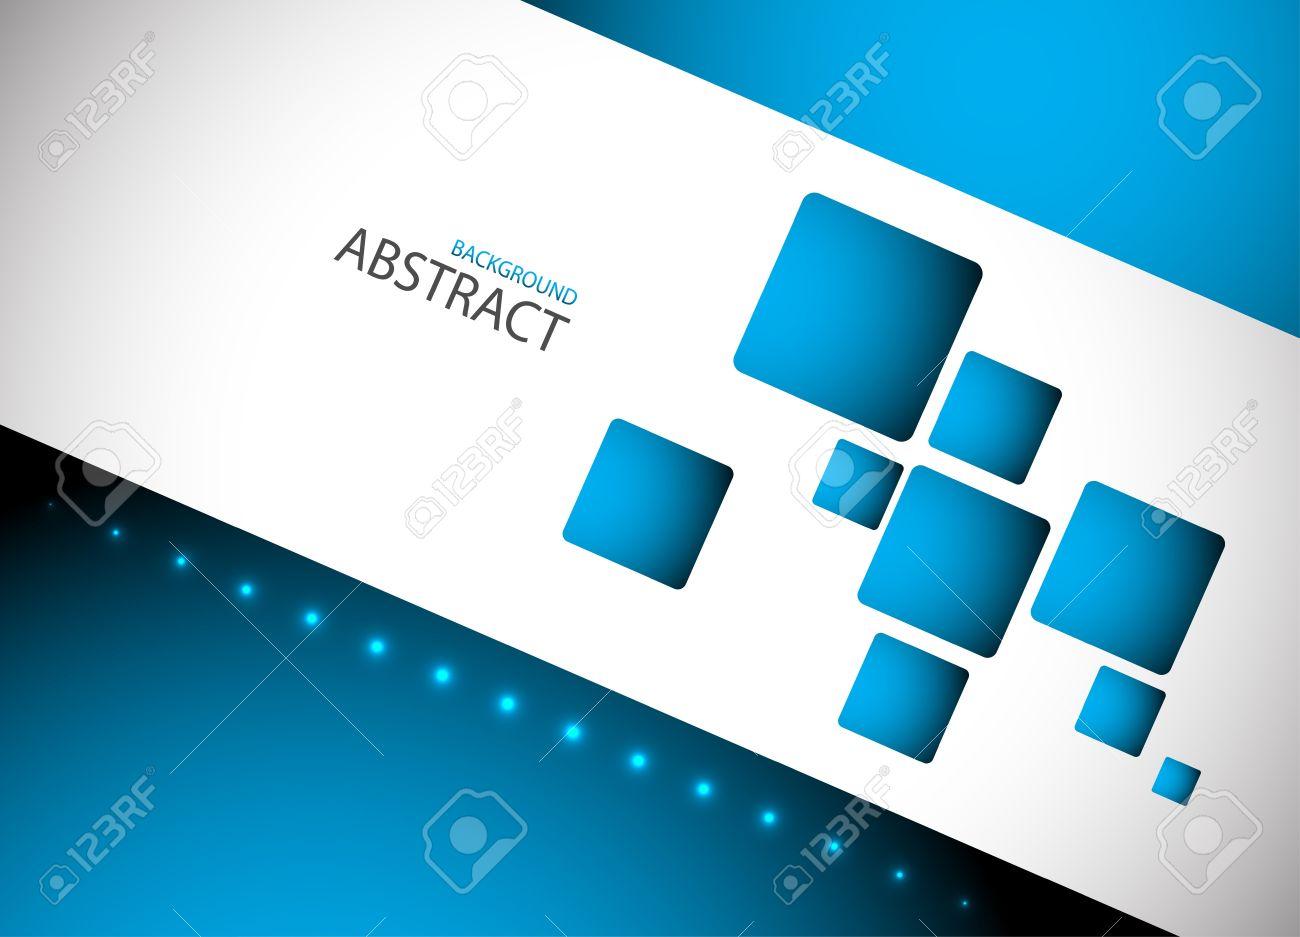 Abstract blue hi-tech background Clip-art - 15688616